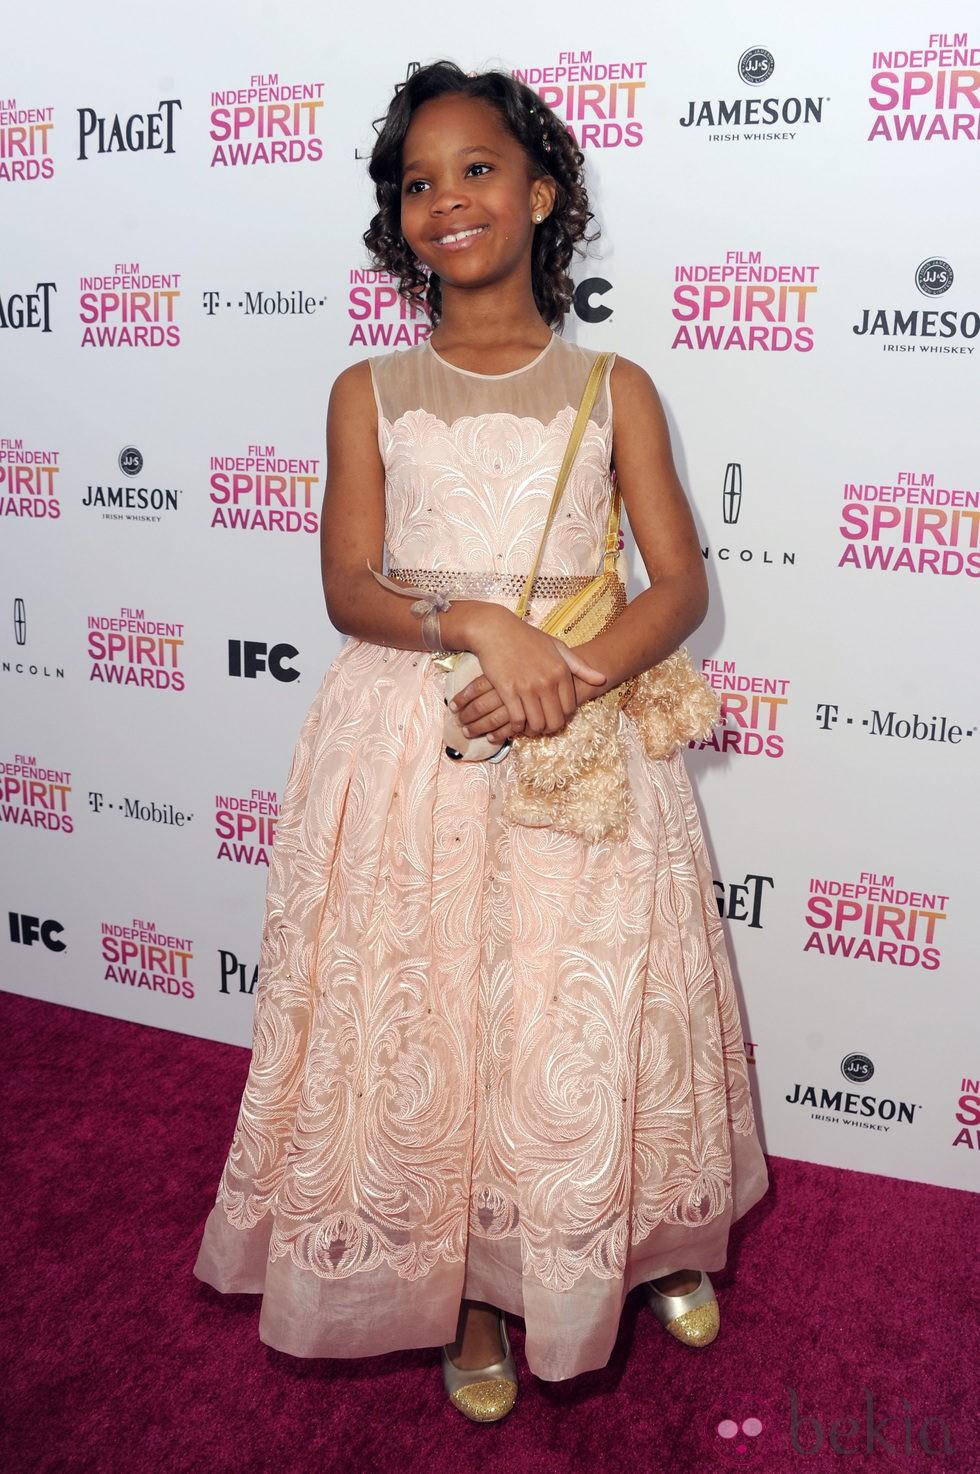 Quvenzhané Wallis en los Independent Spirit Awards 2013